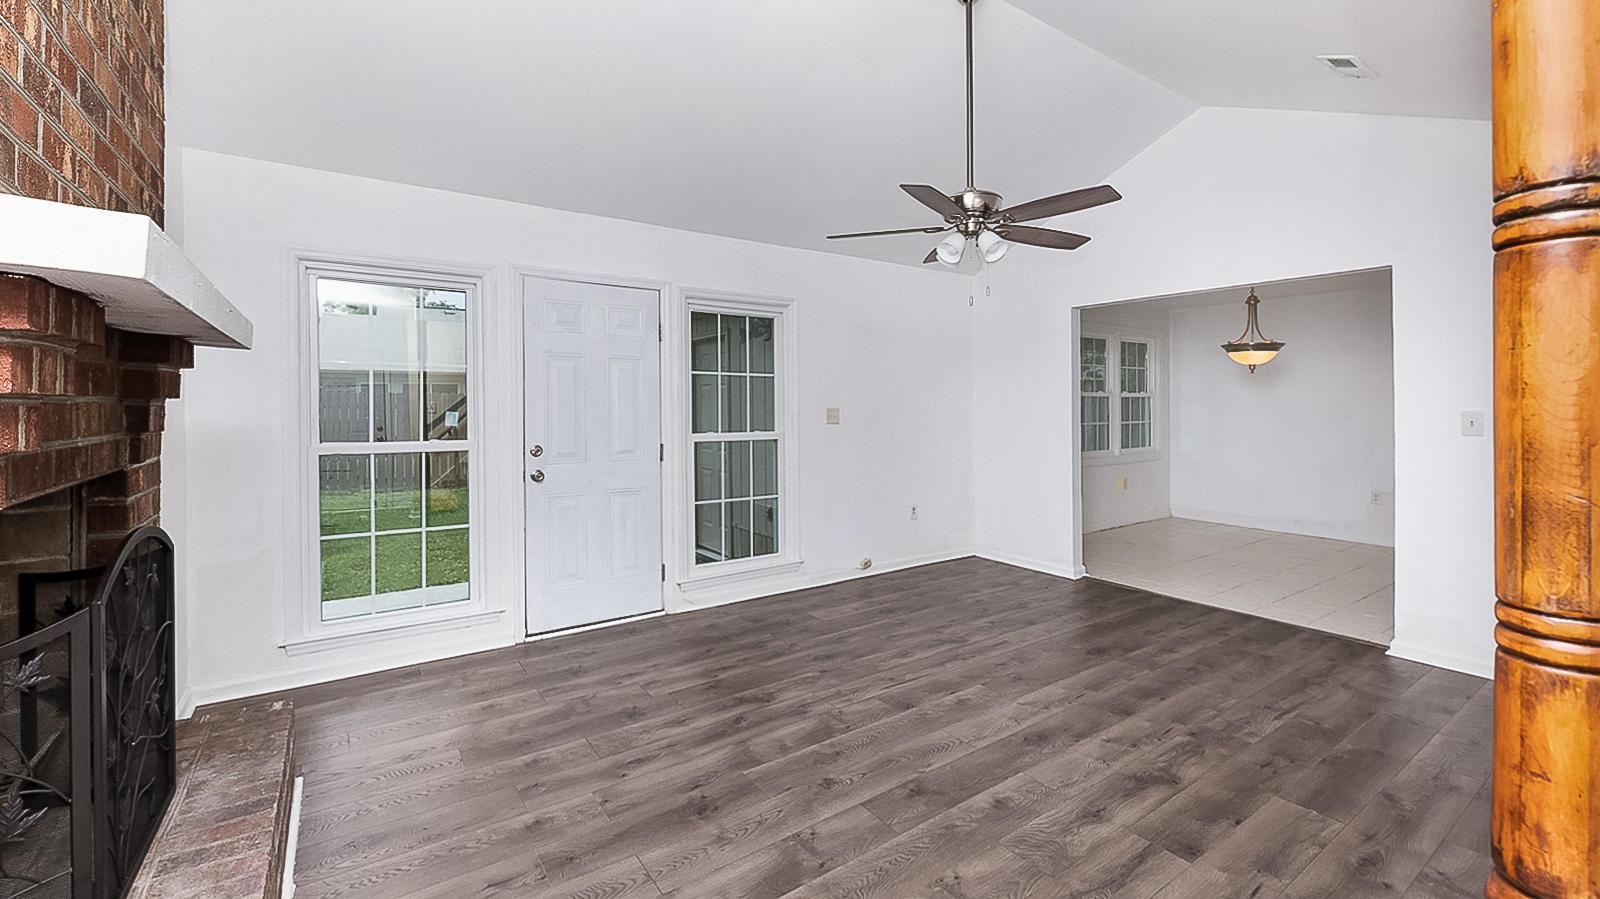 Ashley Villas Homes For Sale - 4315 Briarstone, North Charleston, SC - 30